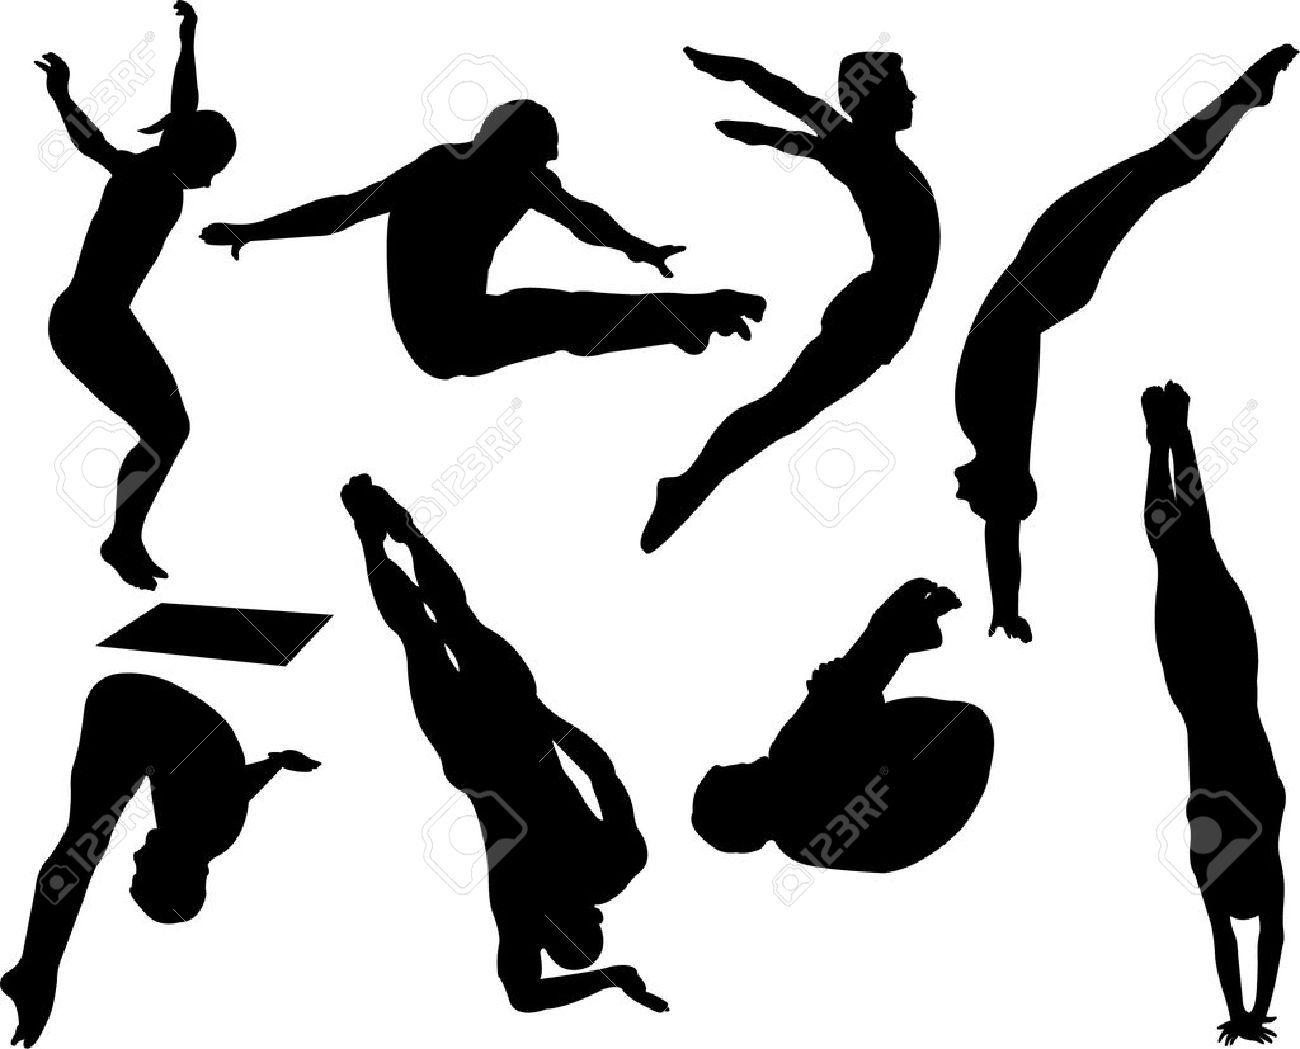 Springboard diver clipart clip free stock high diver silhouette - Google Search   Tattoos ... clip free stock